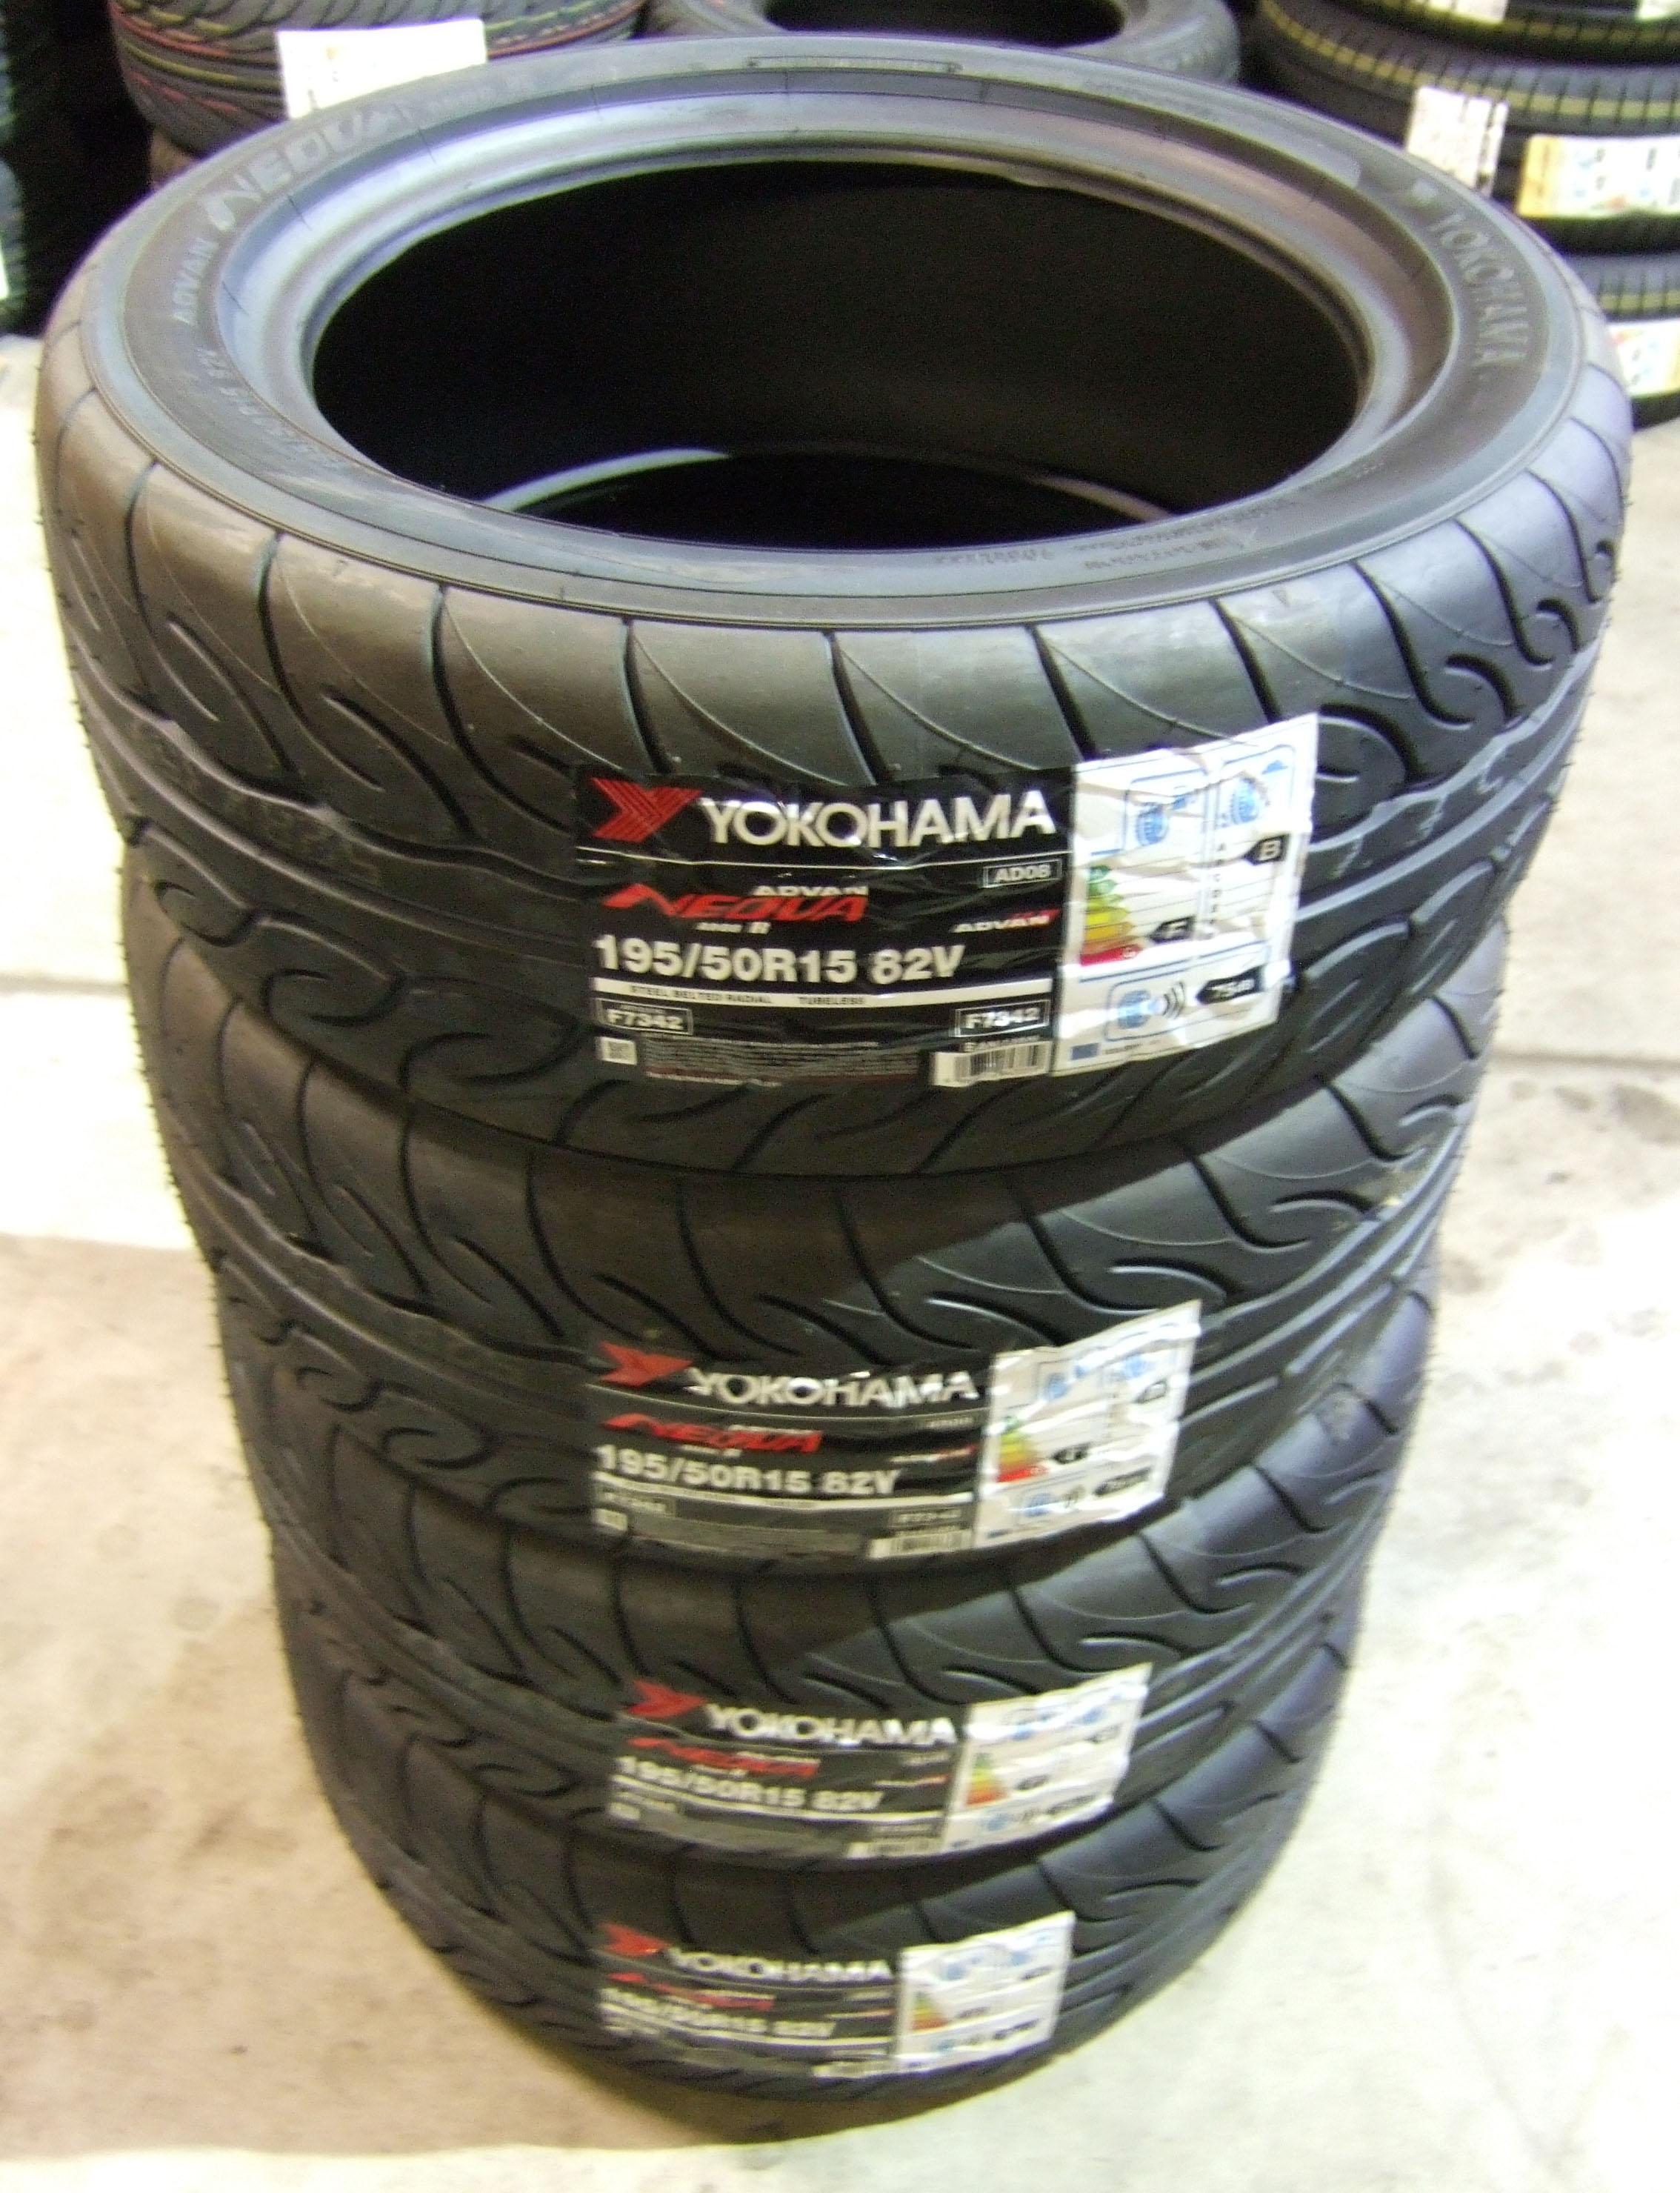 195 50 15 yokohama ad08r road legal track day tyres 1955015 82v 195 50 15 x4 ebay. Black Bedroom Furniture Sets. Home Design Ideas